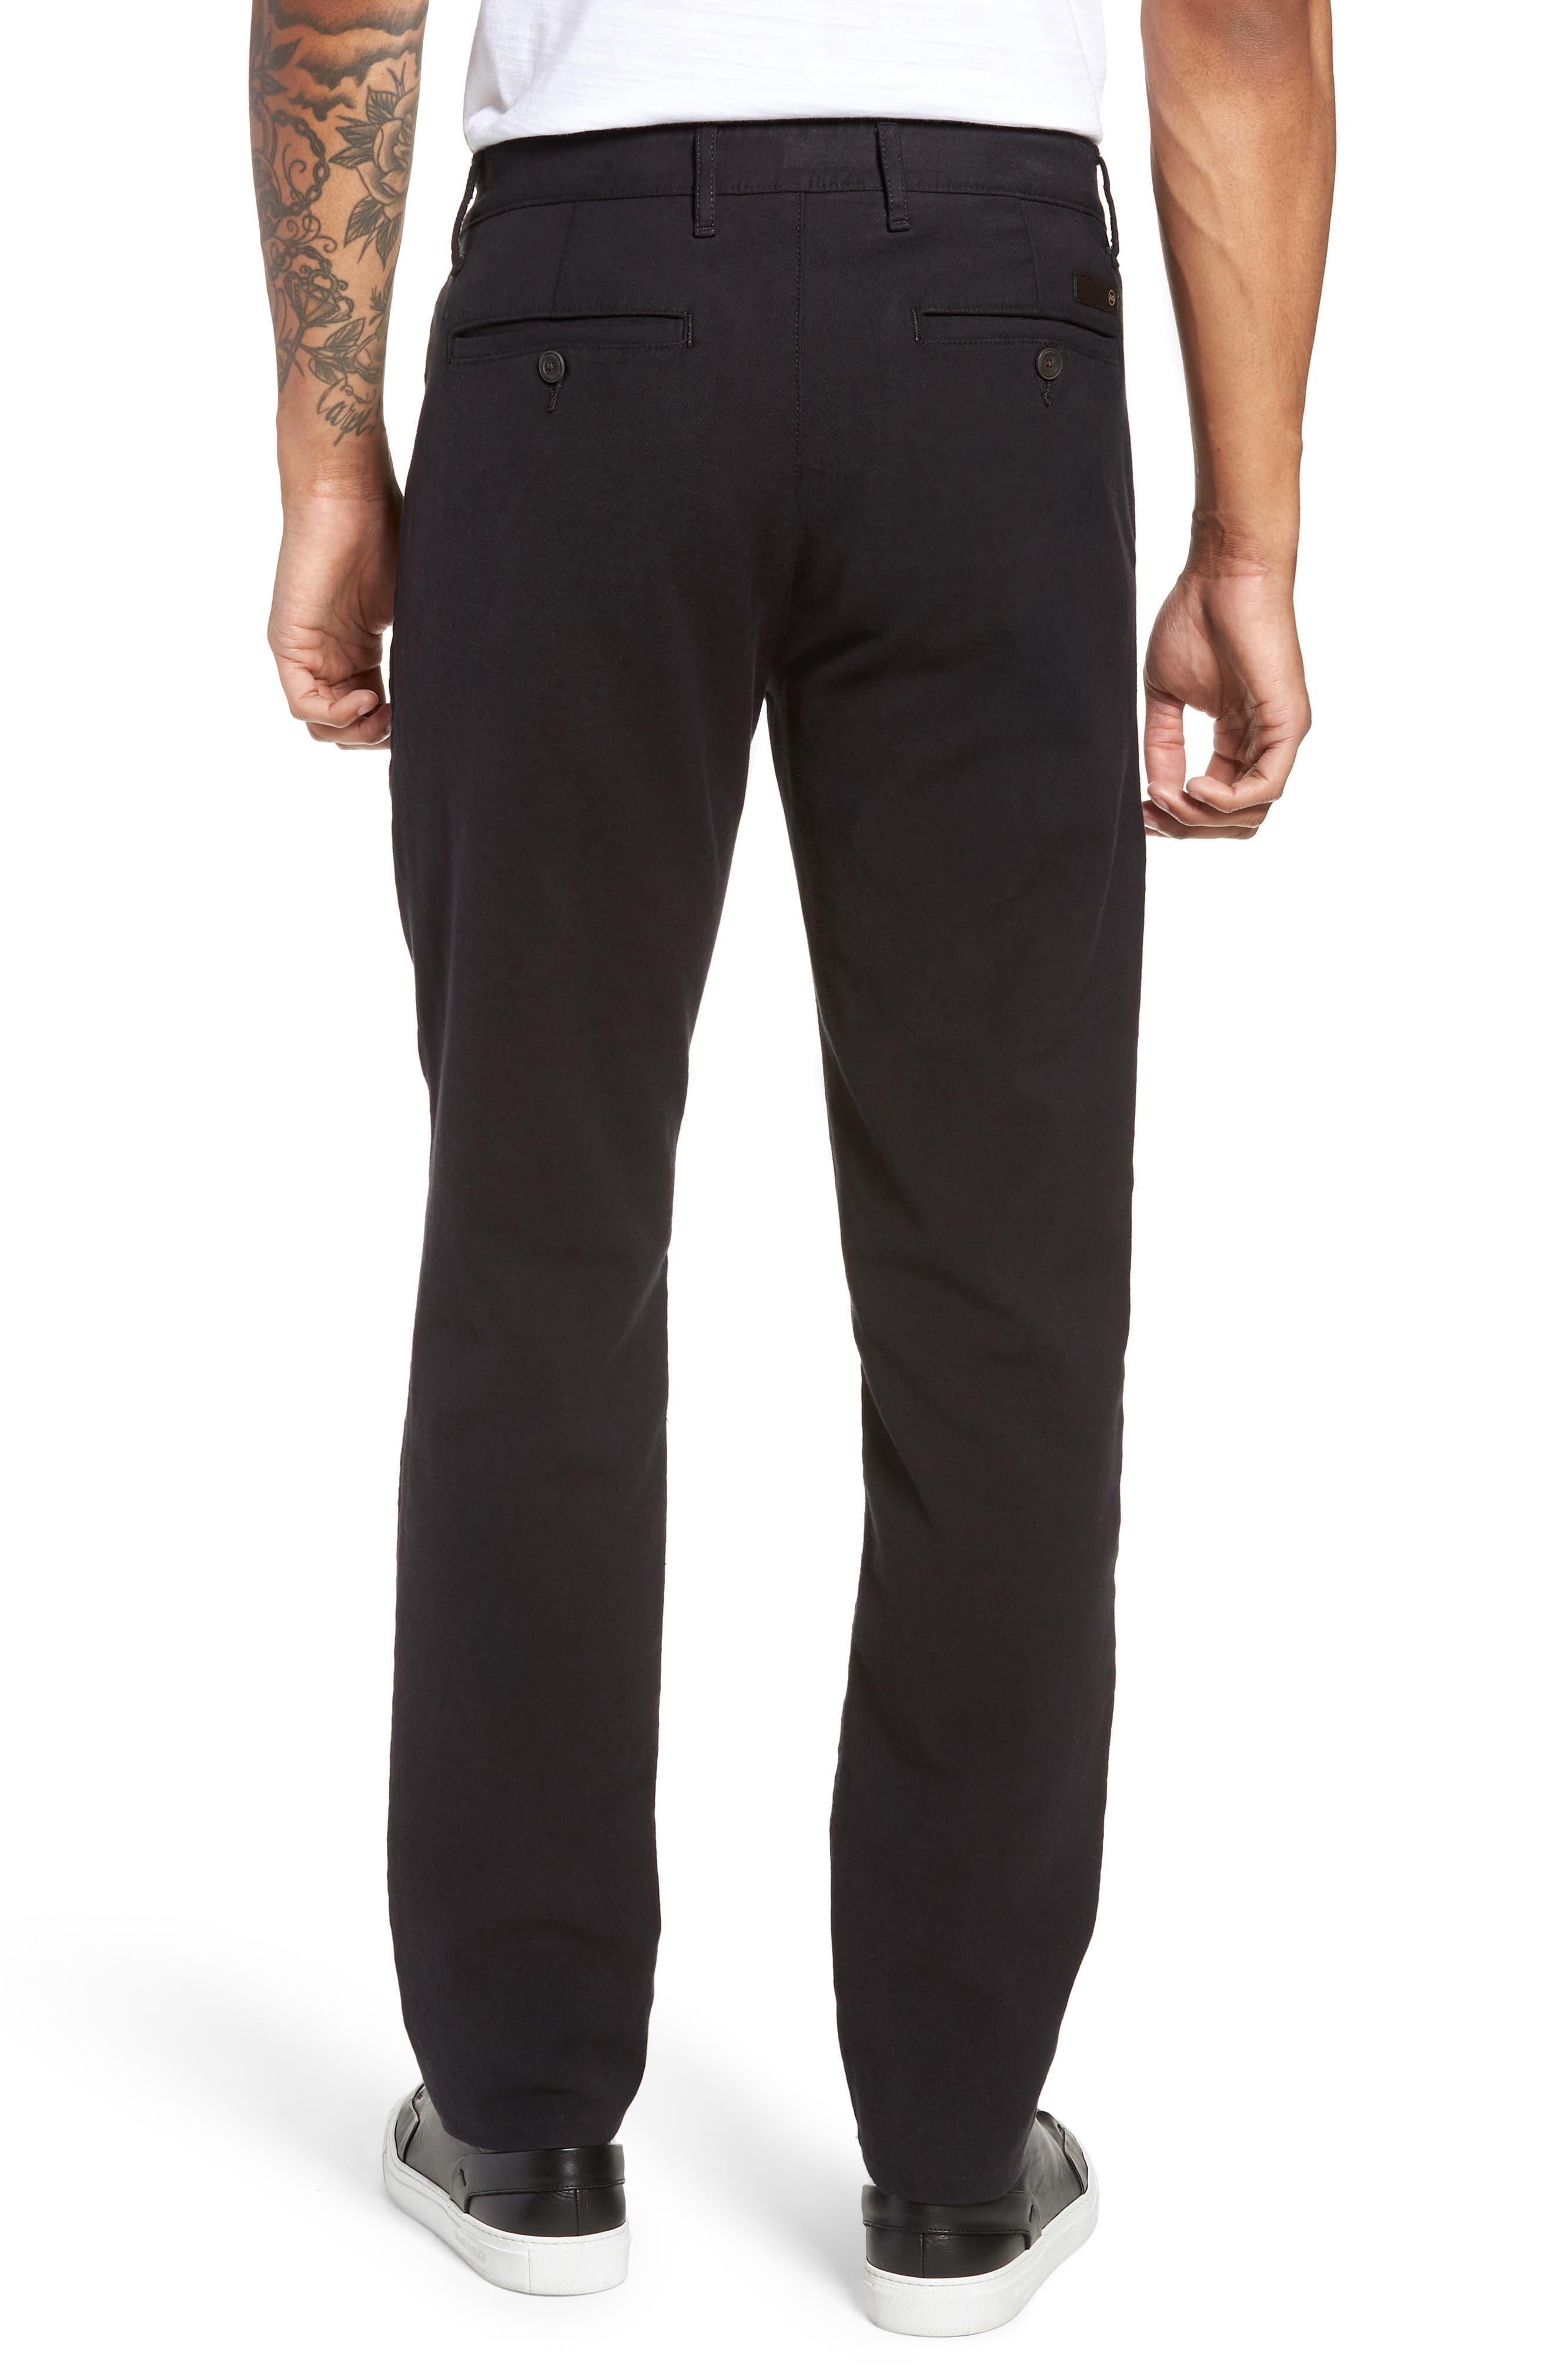 Marshall Slim Fit Chino Pants,                             Alternate thumbnail 2, color,                             GREY STONE